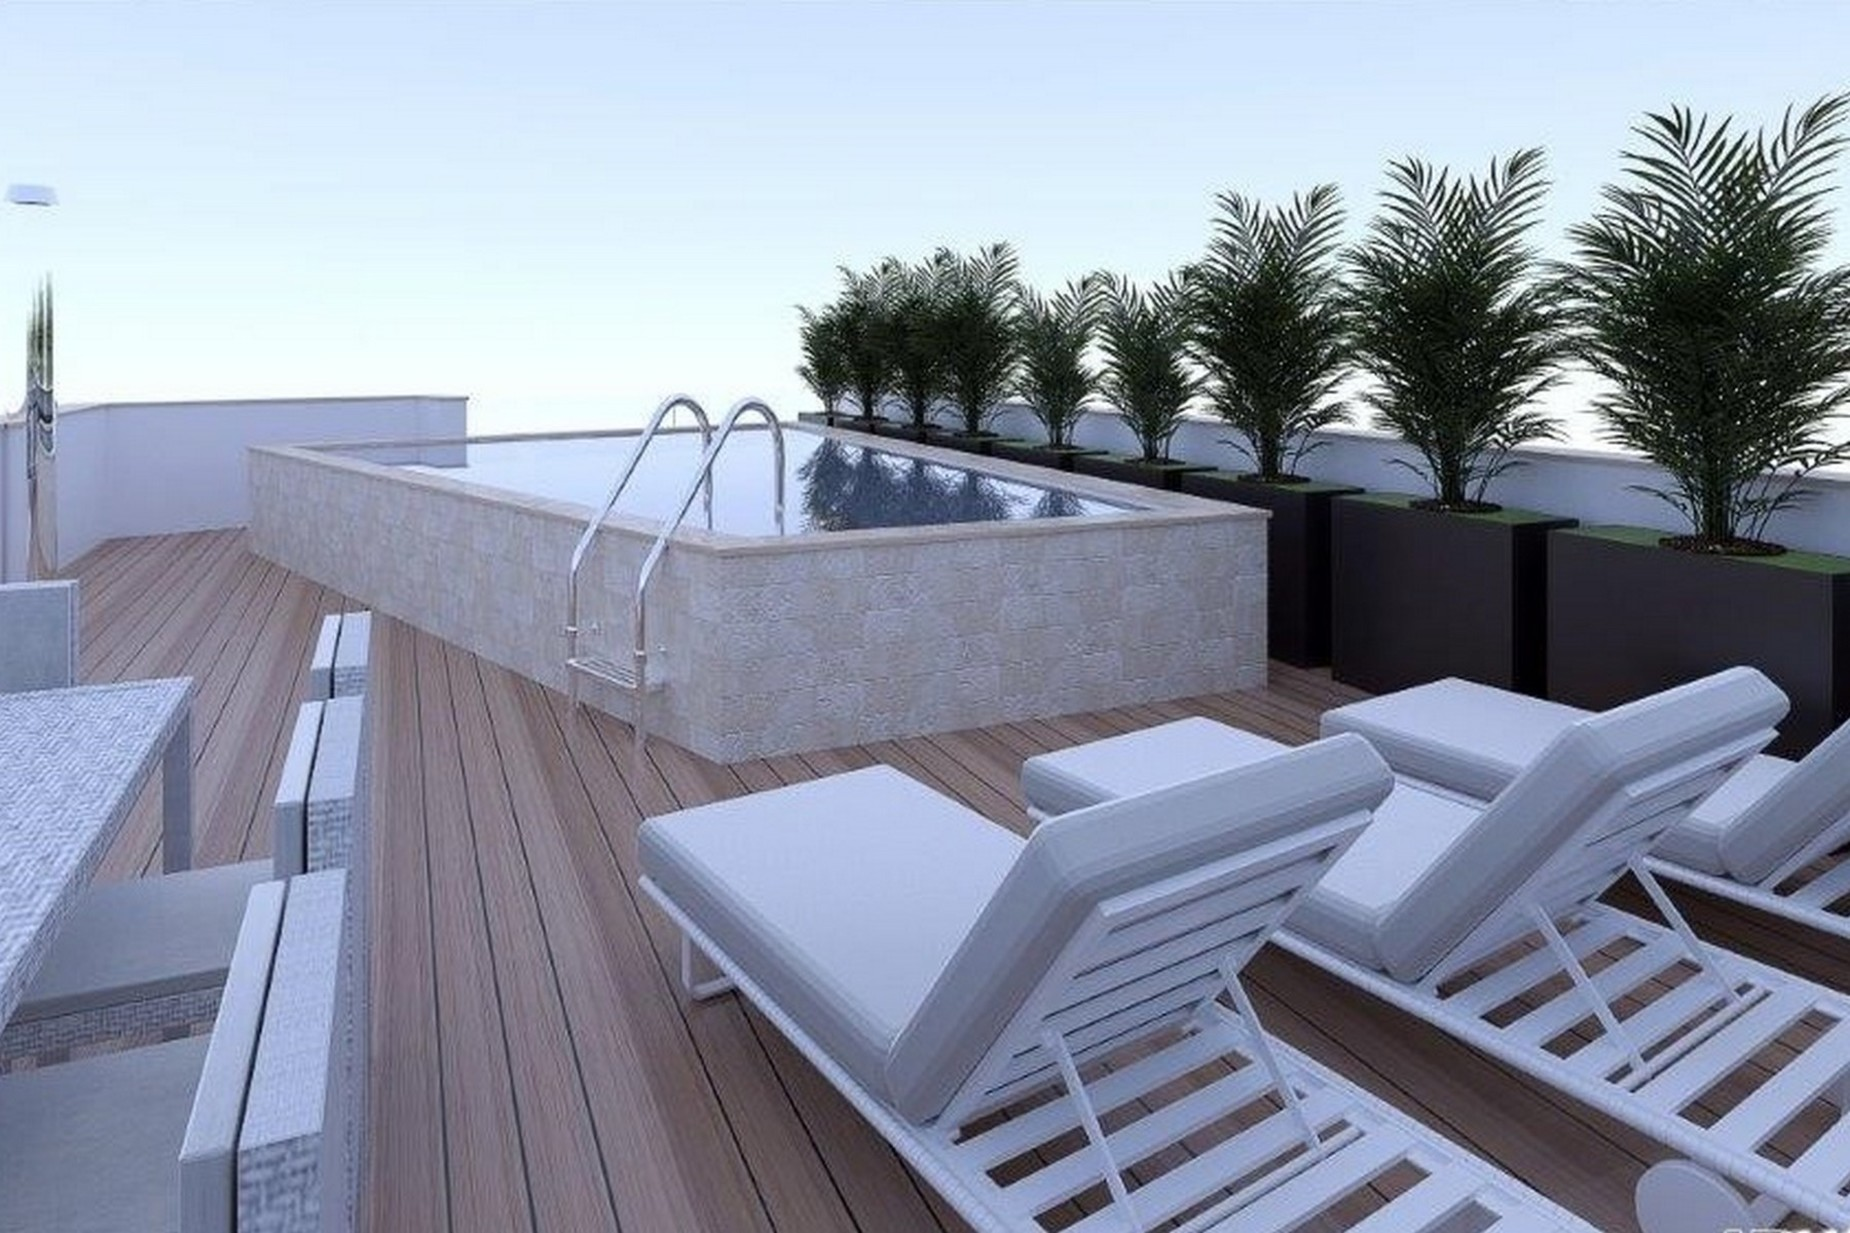 0 bed Block of Apartments (Res) For Sale in Balzan, Balzan - thumb 8